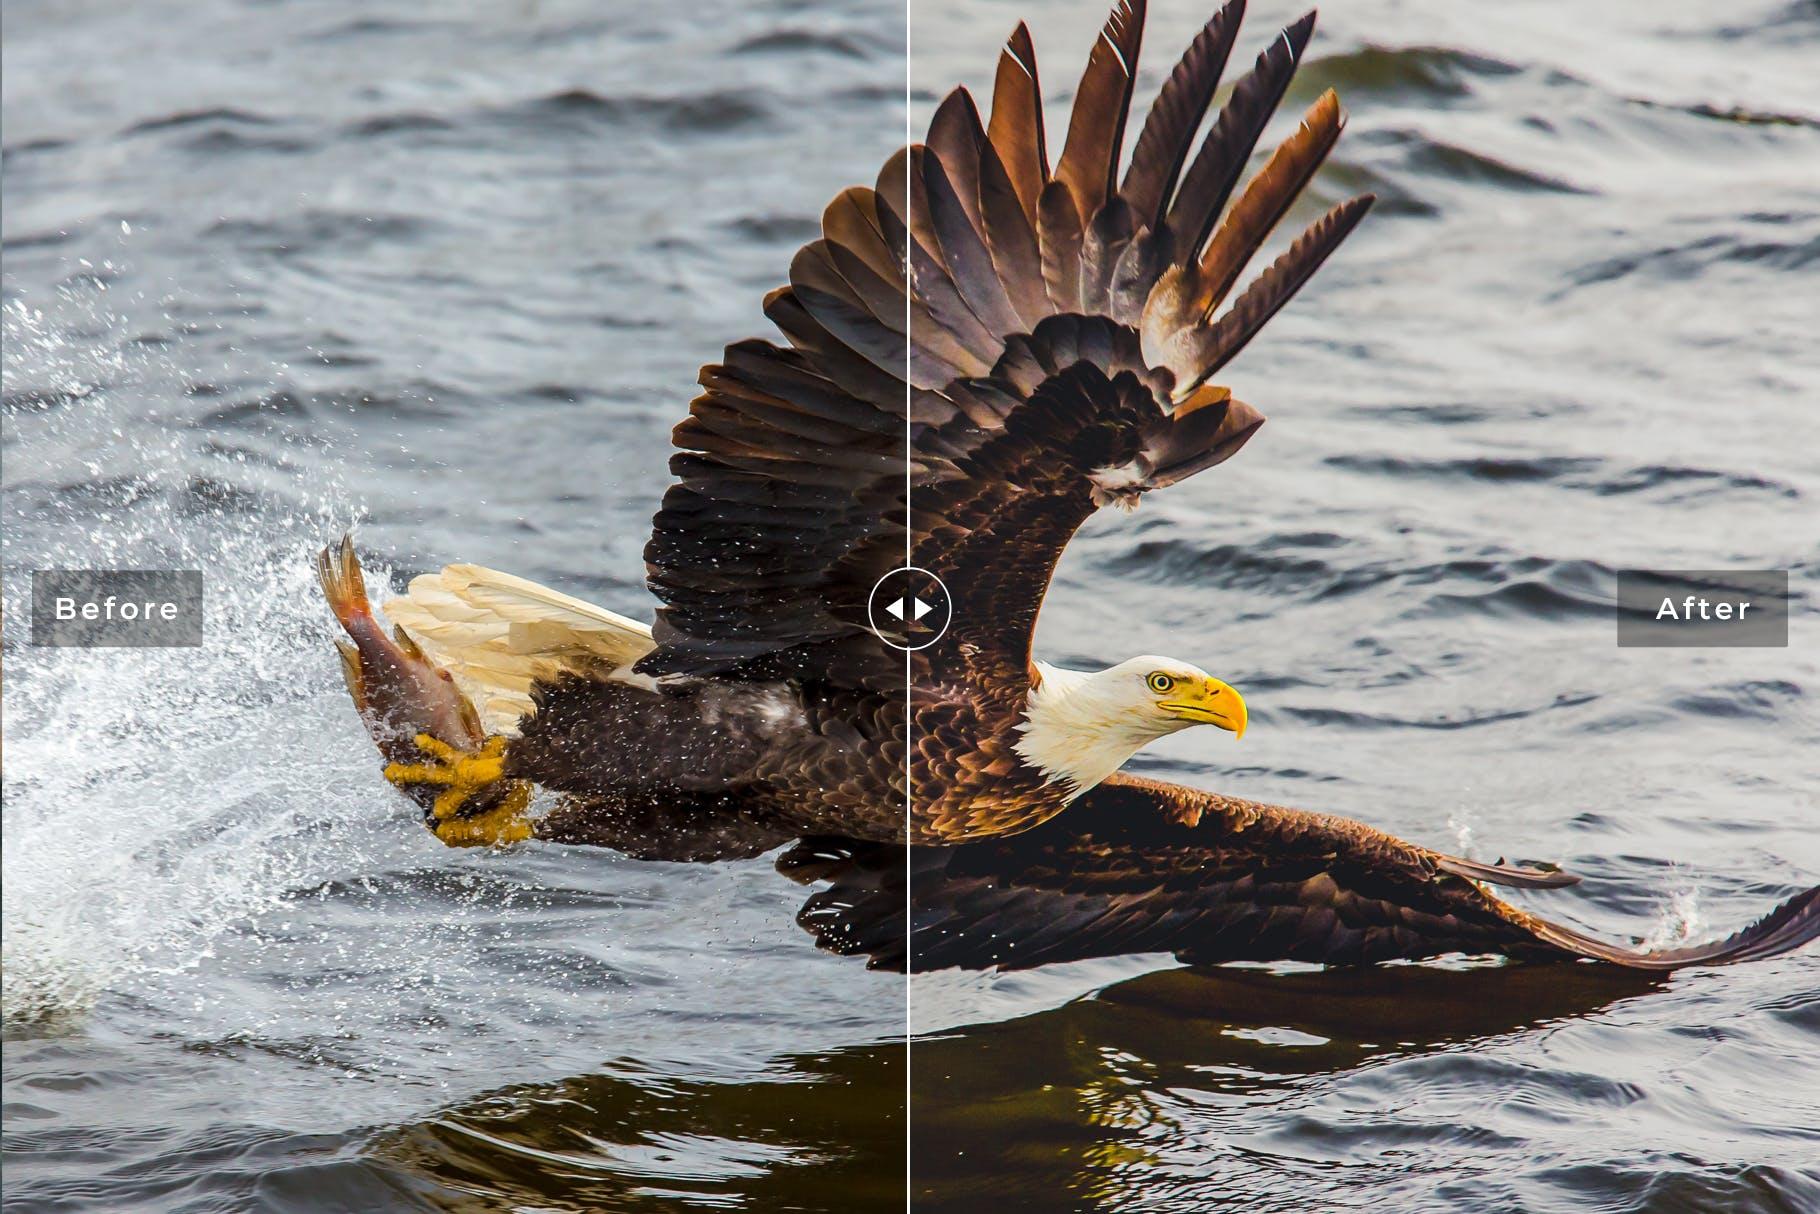 鸟类摄影优化照片效果处理LR预设Birds Wings Mobile Desktop Lightroom Presets插图(2)